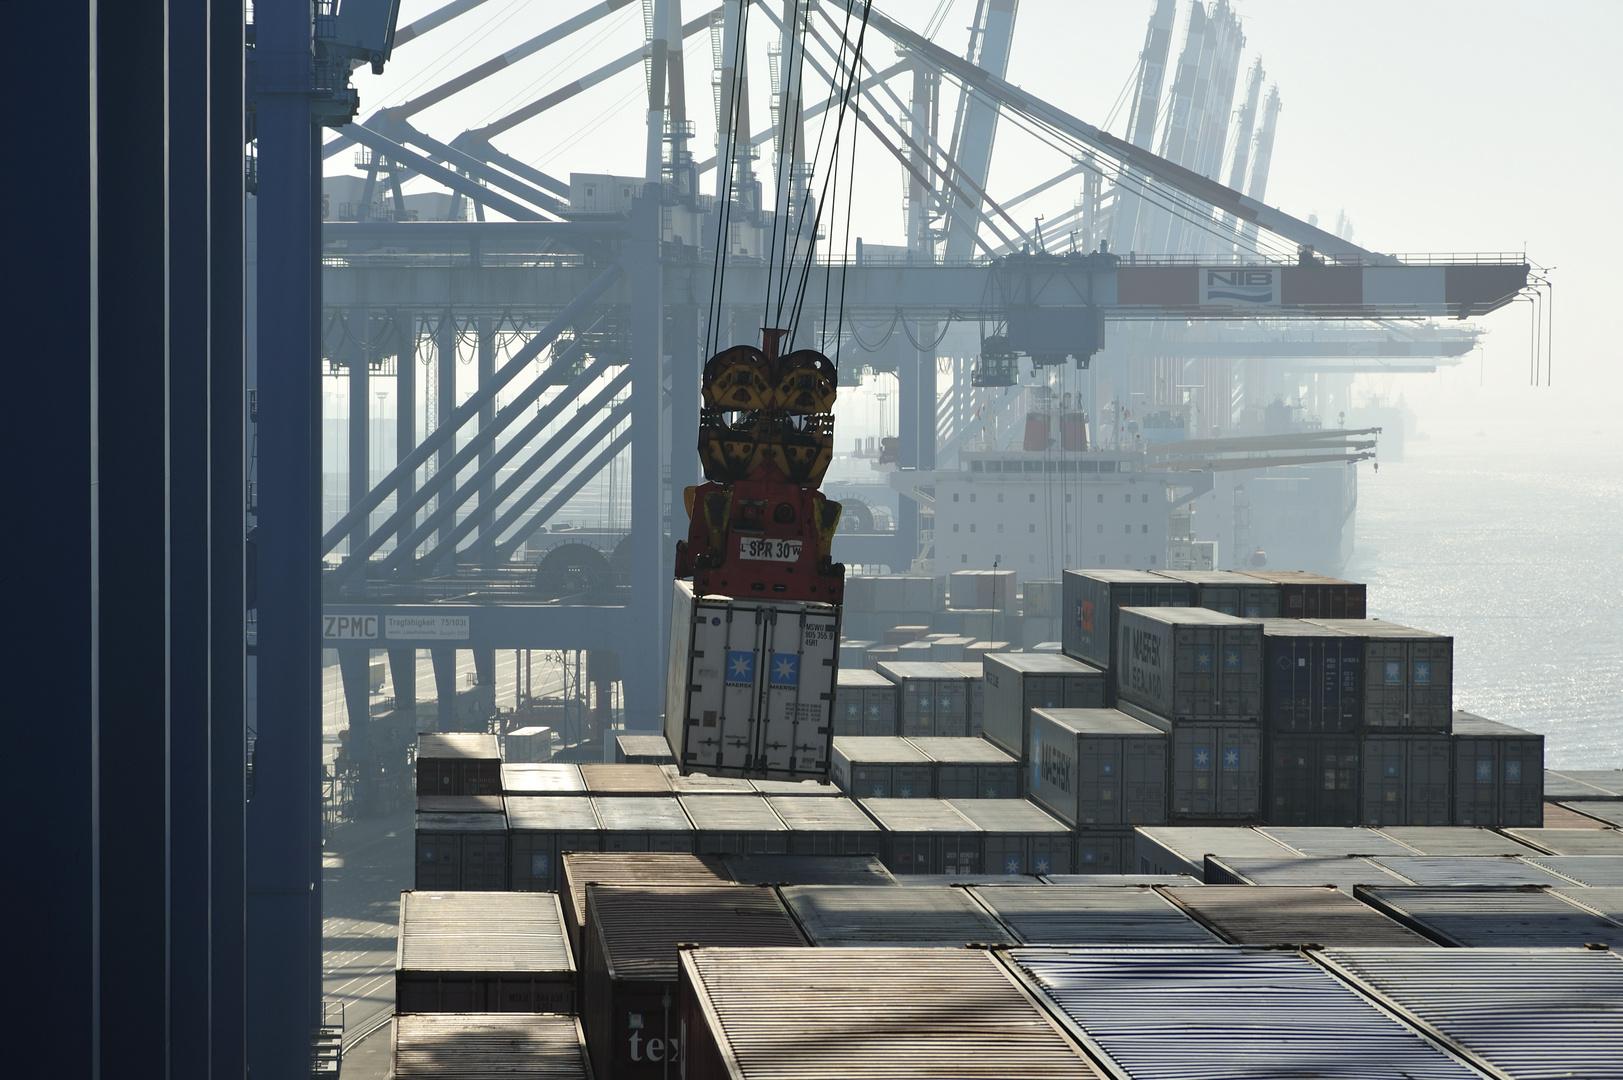 Container Terminal Bremerhaven - 02